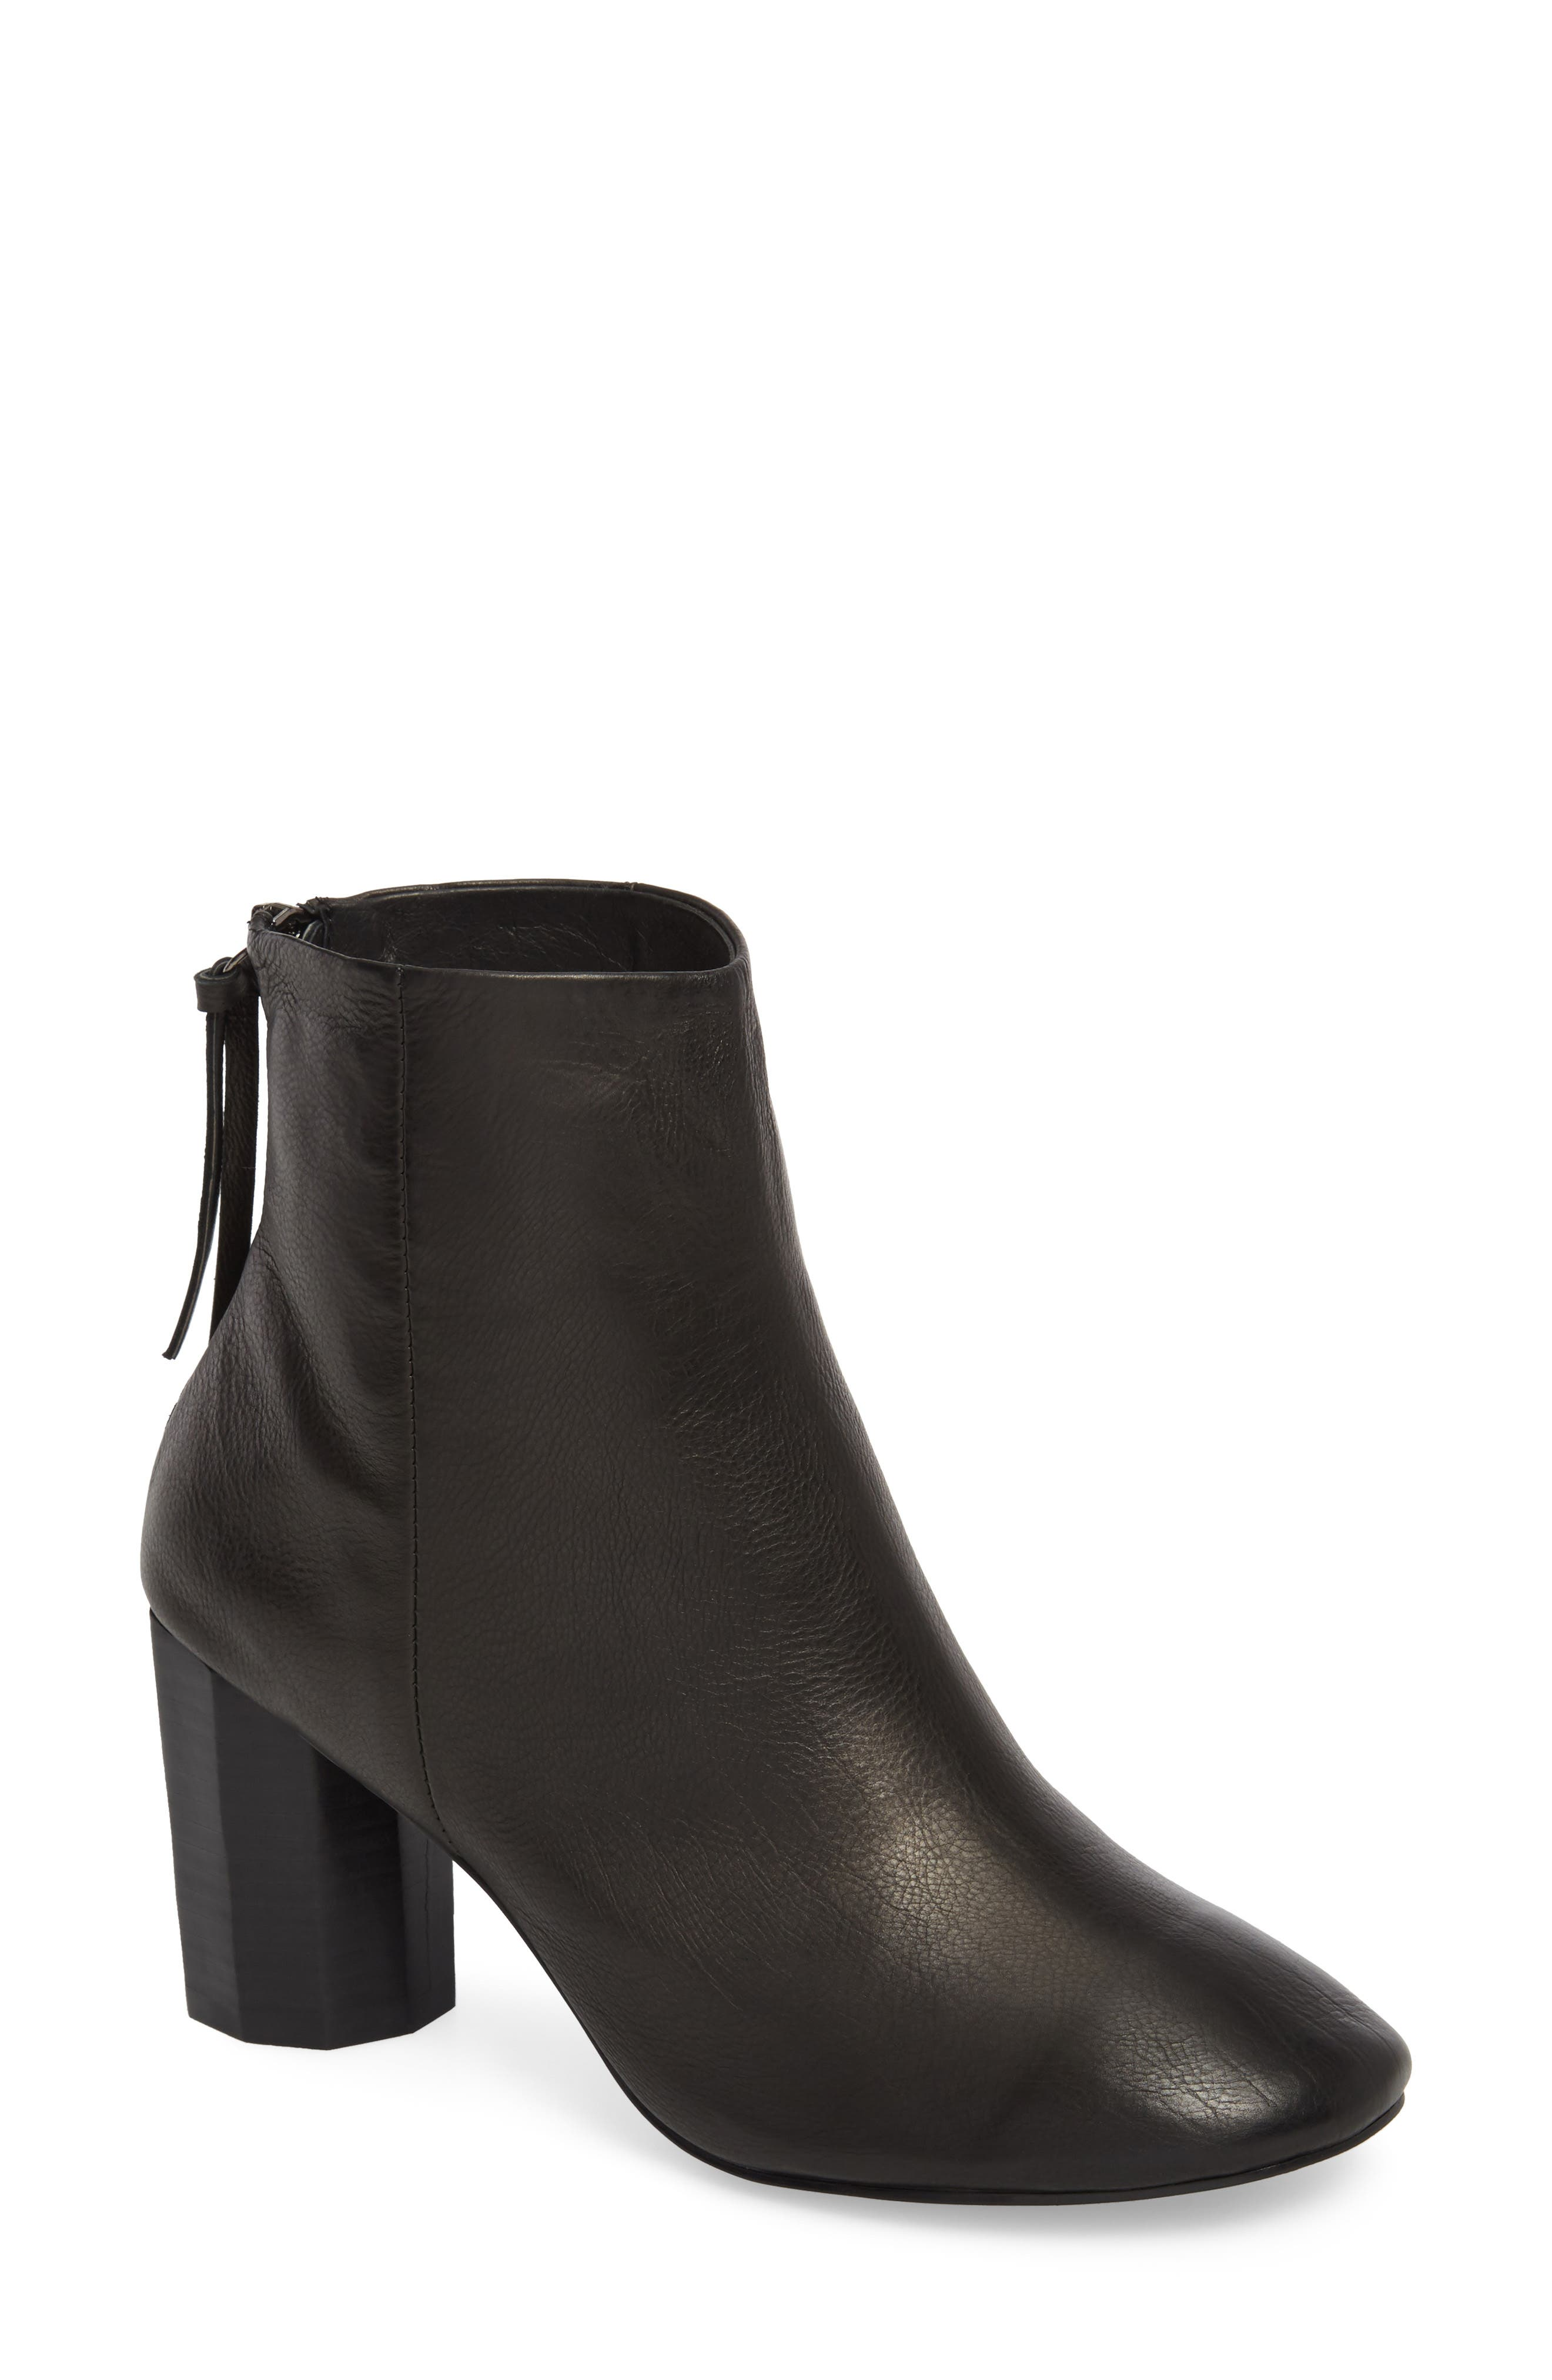 Sadie Column Heel Bootie,                             Main thumbnail 1, color,                             Black Leather